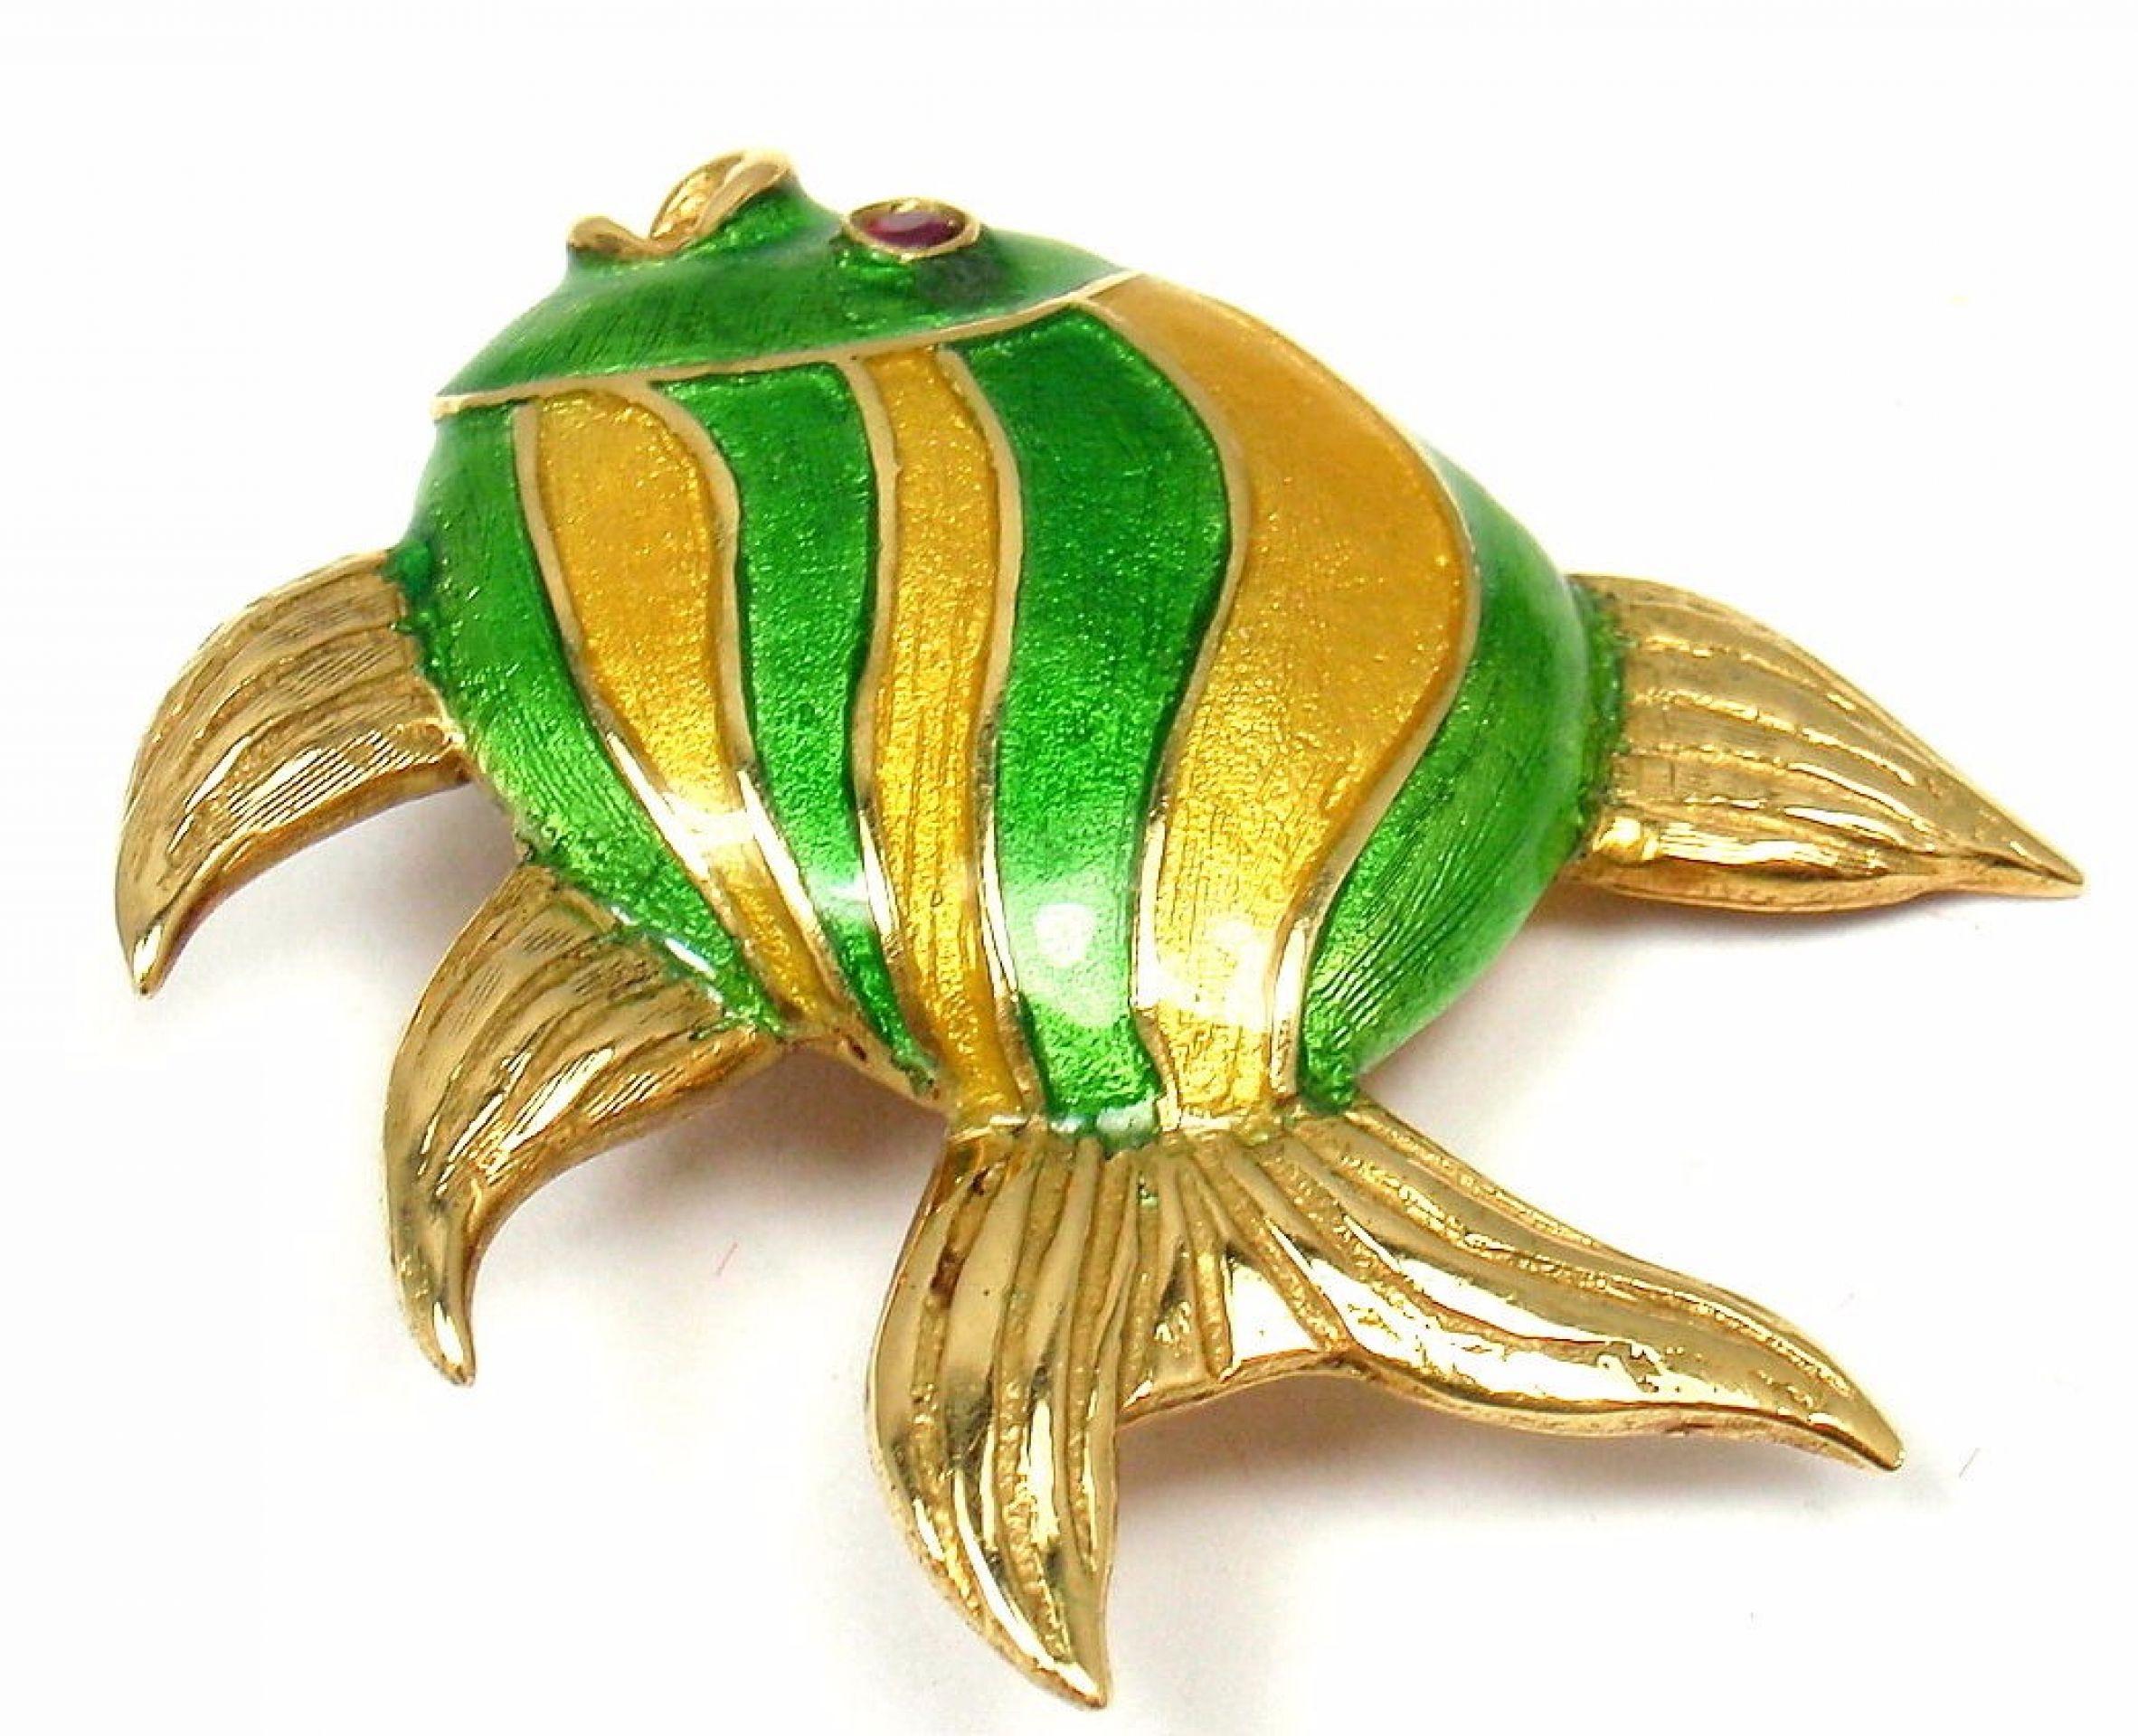 Rare Vintage Cartier 18k Yellow Gold Enamel Animalia Peacock Fish Brooch Pin